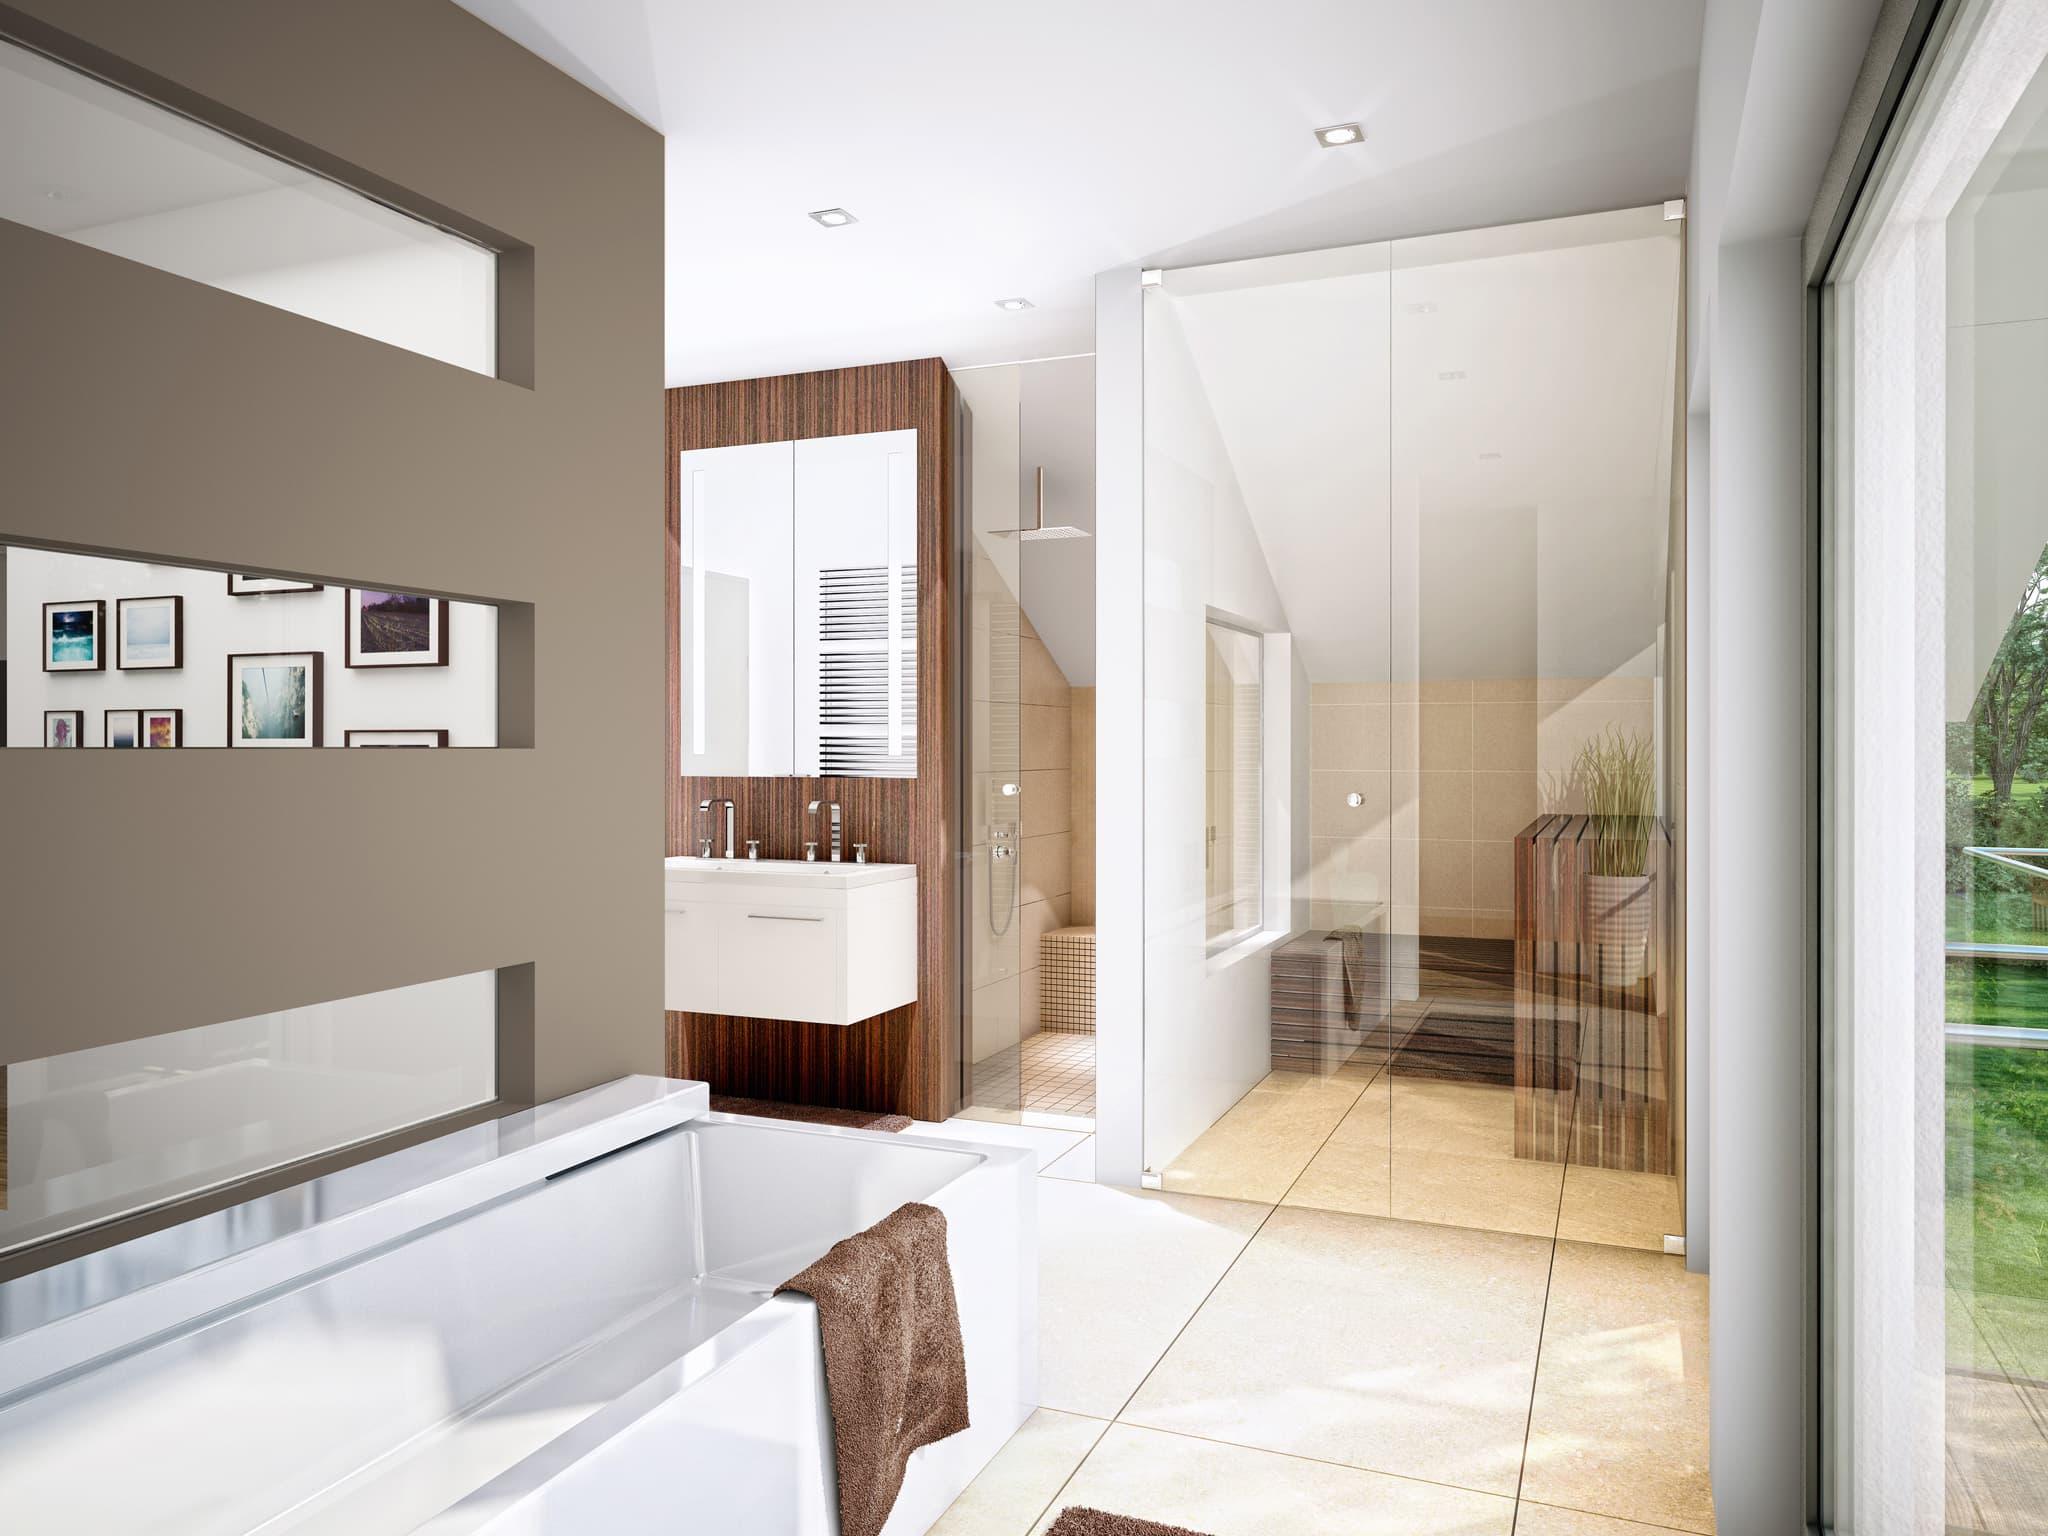 Badezimmer - Ideen Inneneinrichtung Einfamilienhaus Bien-Zenker Fertighaus CONCEPT-M Muenchen - HausbauDirekt.de